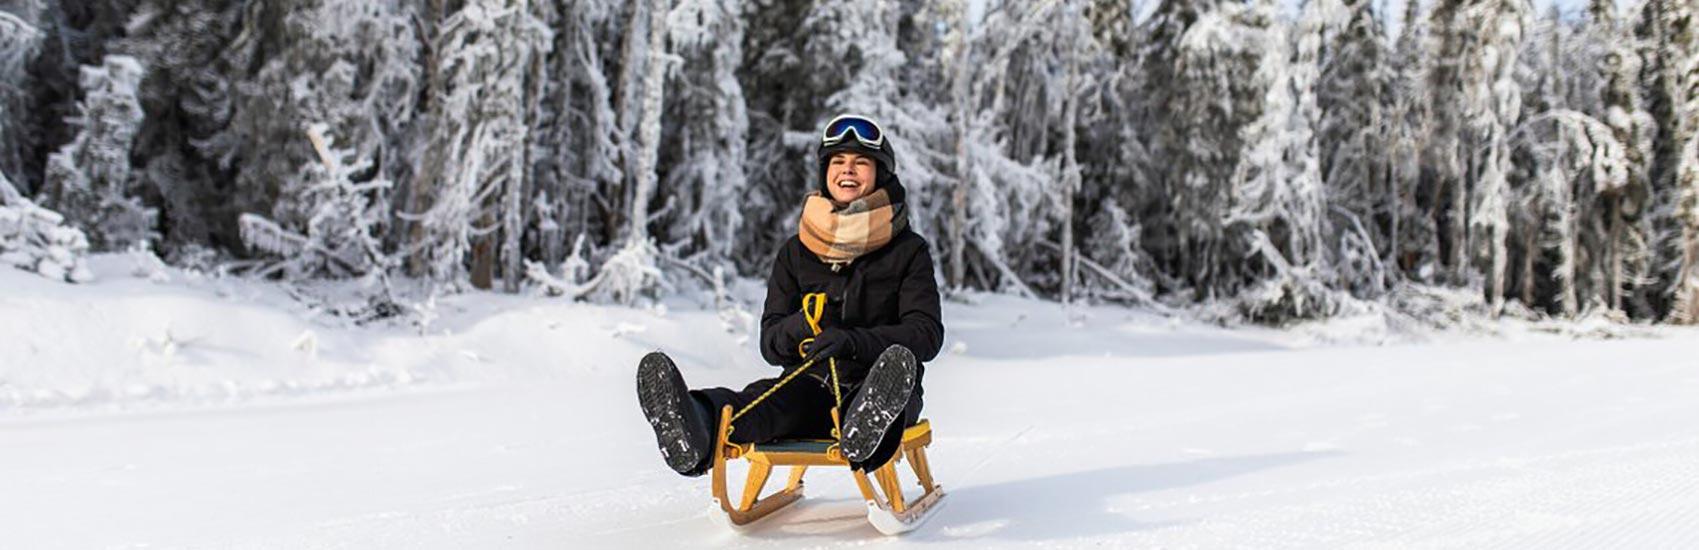 Ski Getaways on Sale with Club Med 1